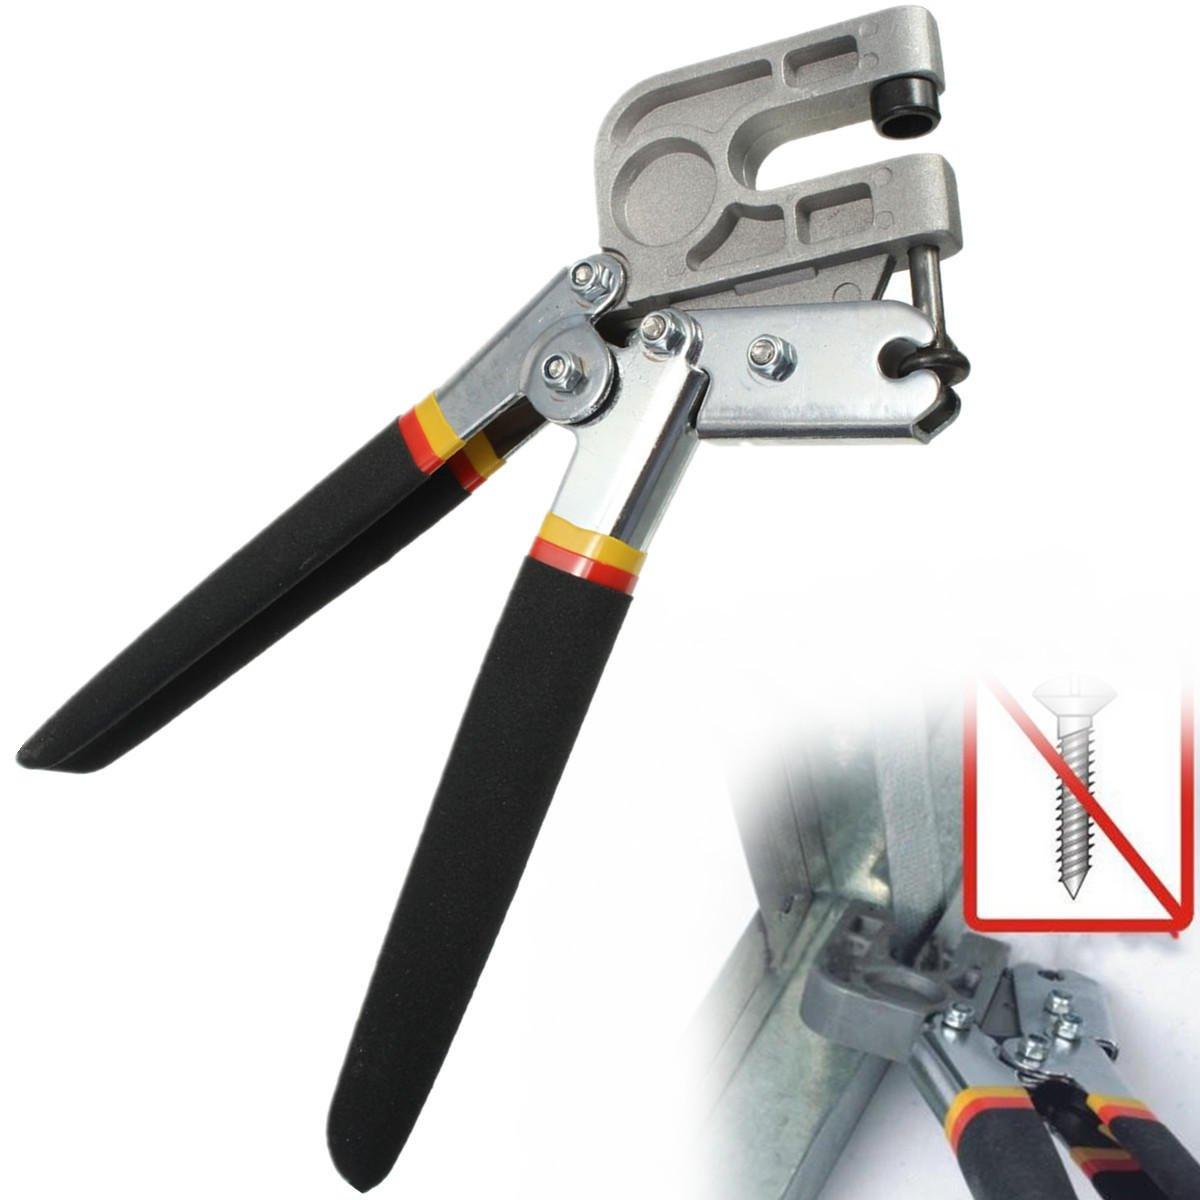 10 Inch TPR Handle Stud Crimper Plaster Board Drywall Tool for Fastening Metal Studs